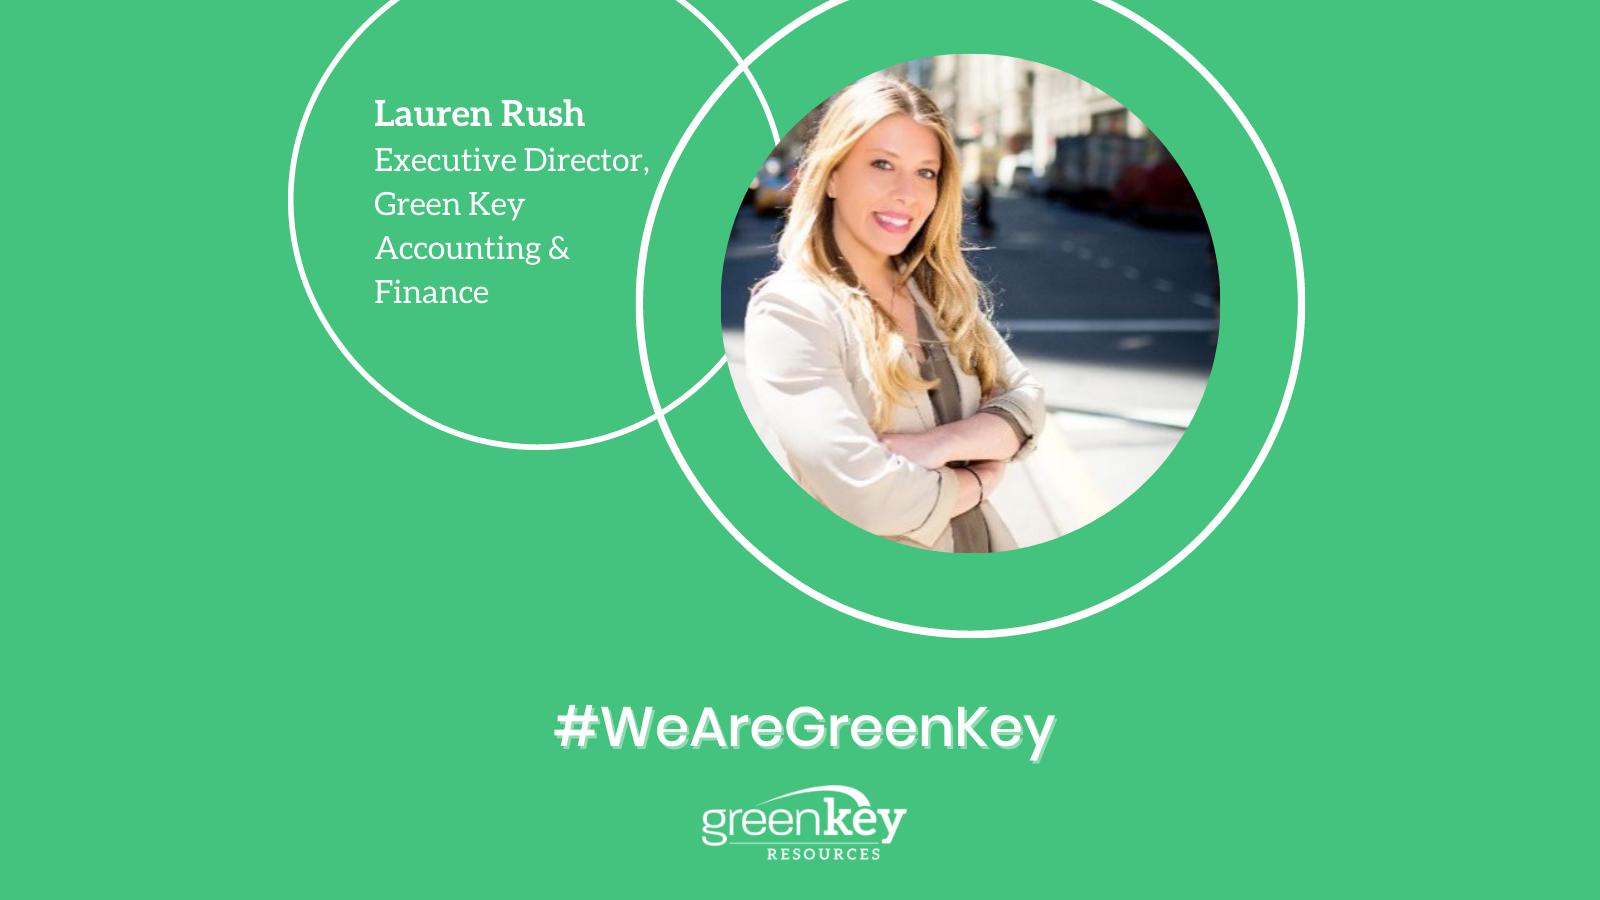 Lauren Rush - Executive Director, Green Key Accounting & Finance